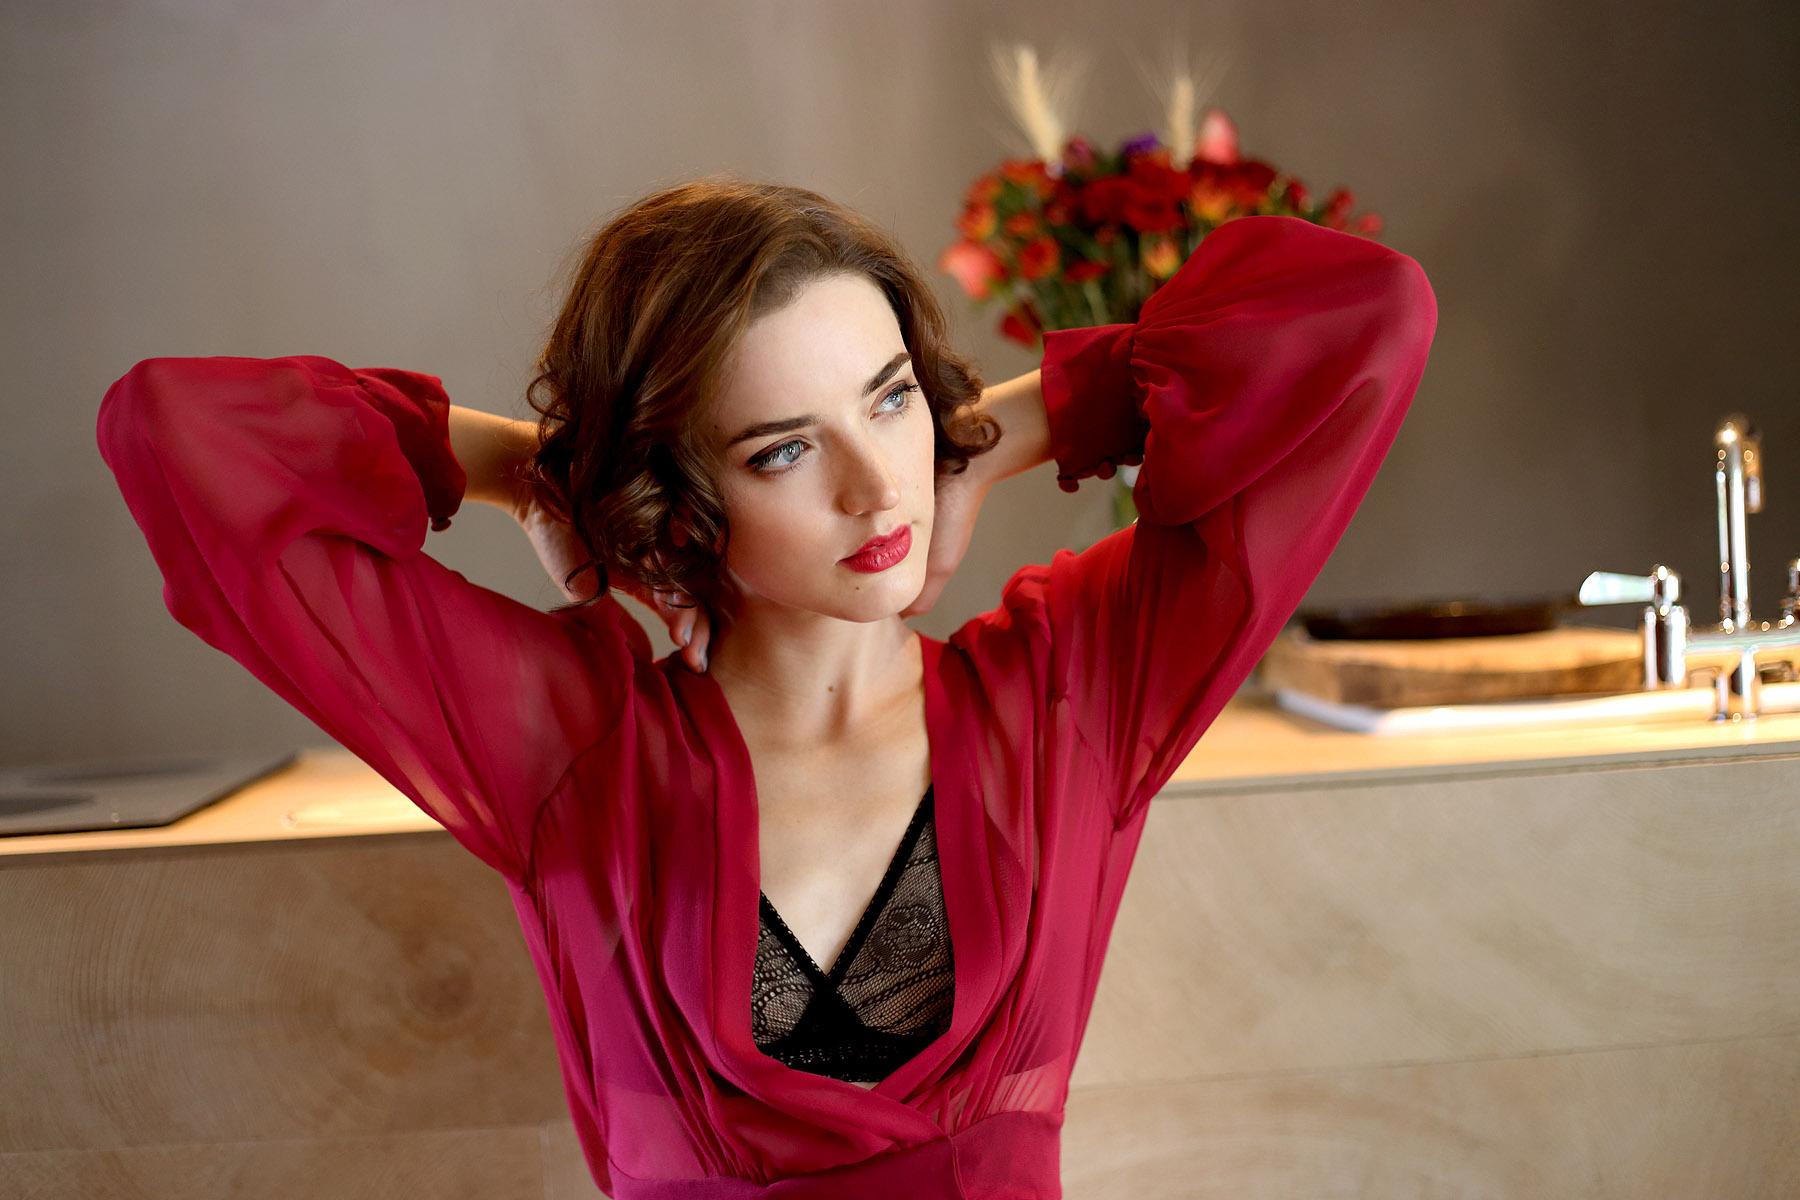 holiday-14-bts-lingerie-lookbook-red-sheer-romance-robe-closeup-2.jpg